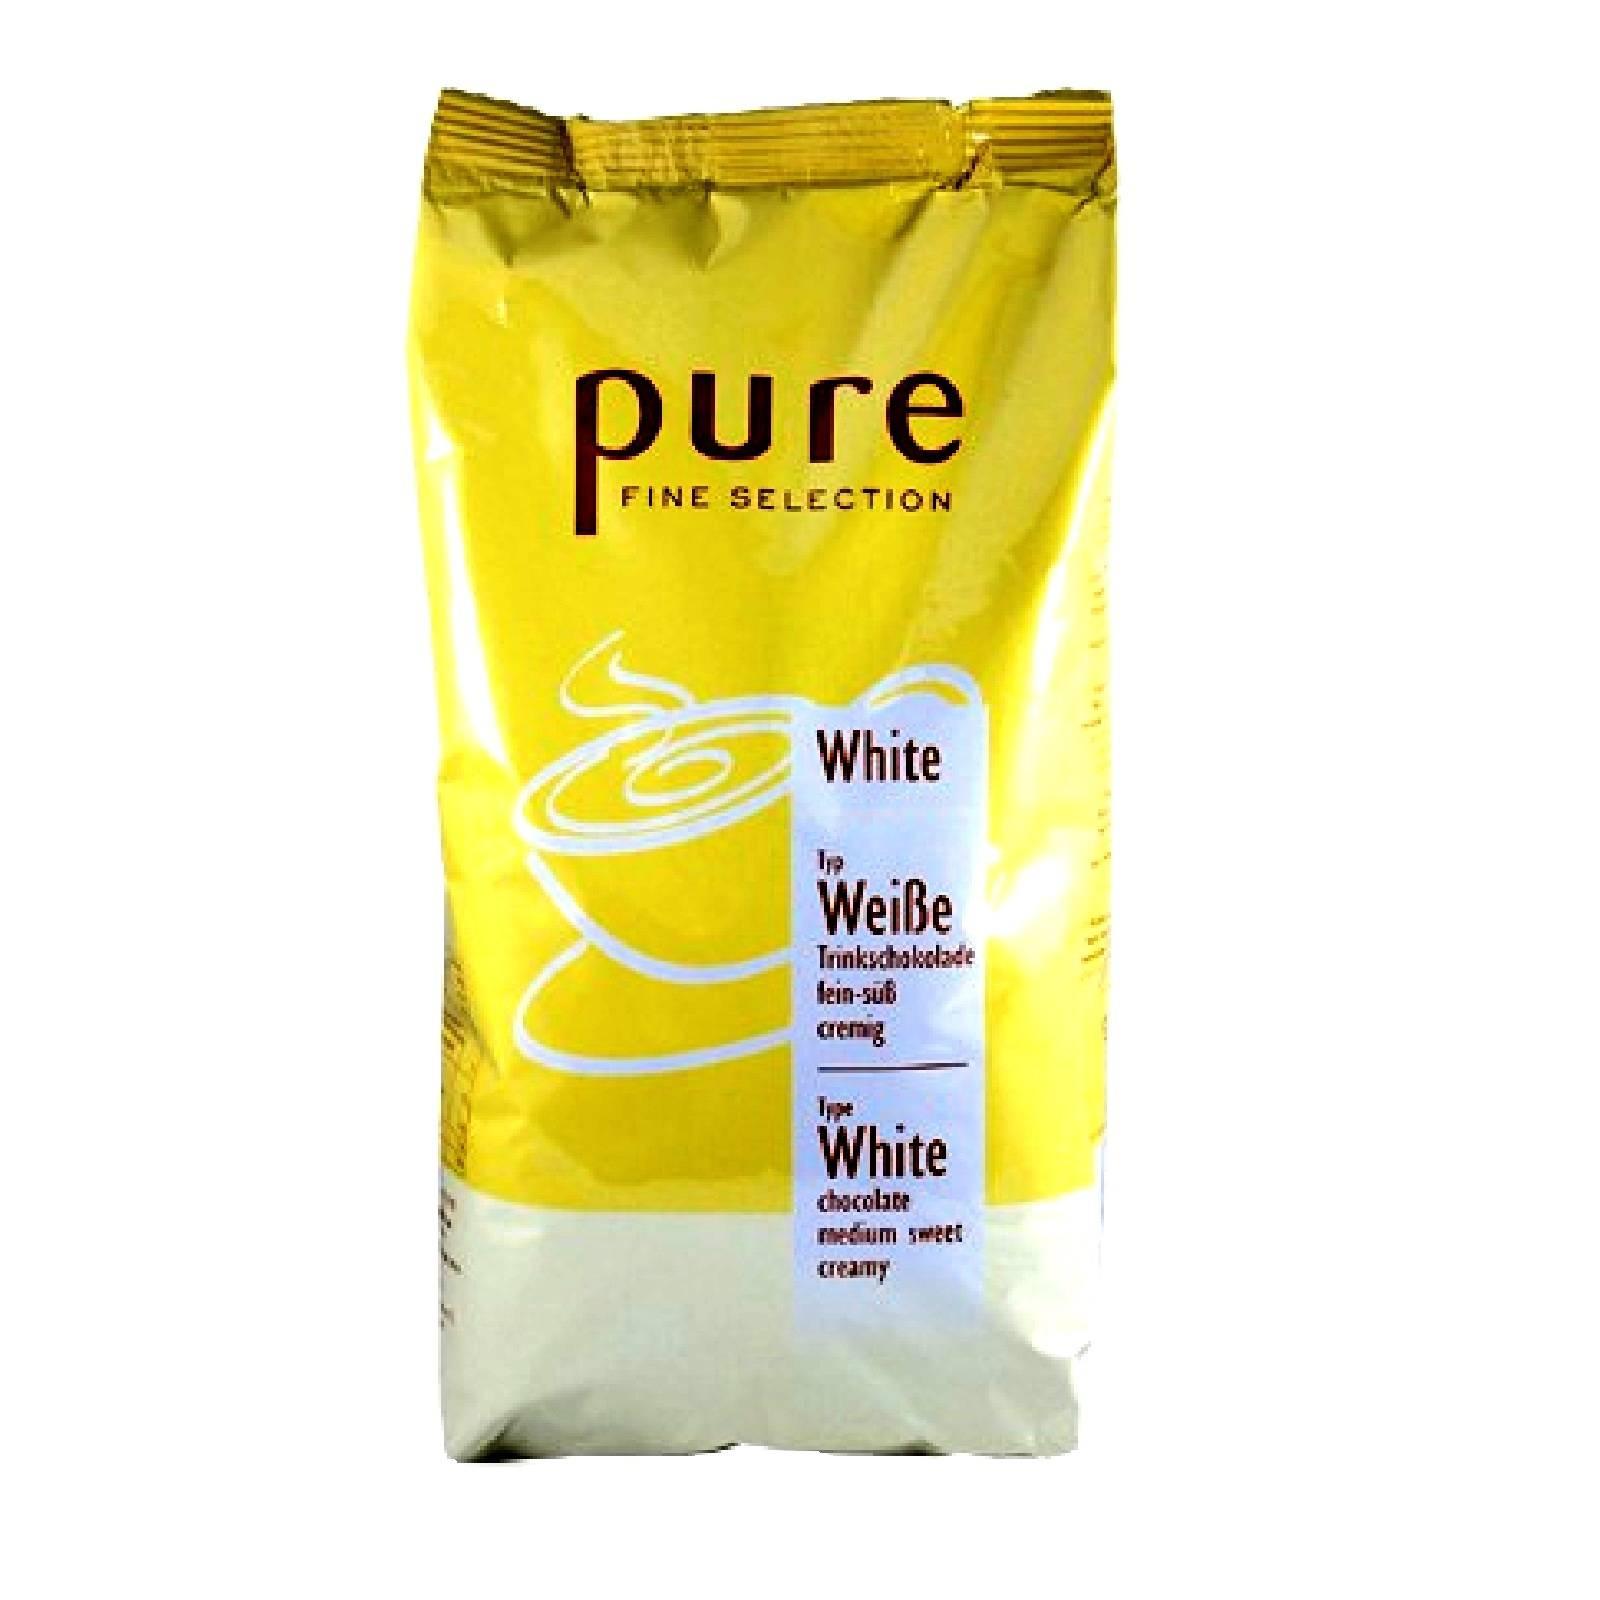 tchibo pure fine selection kakao white 1kg wei e trinkschokolade ebay. Black Bedroom Furniture Sets. Home Design Ideas